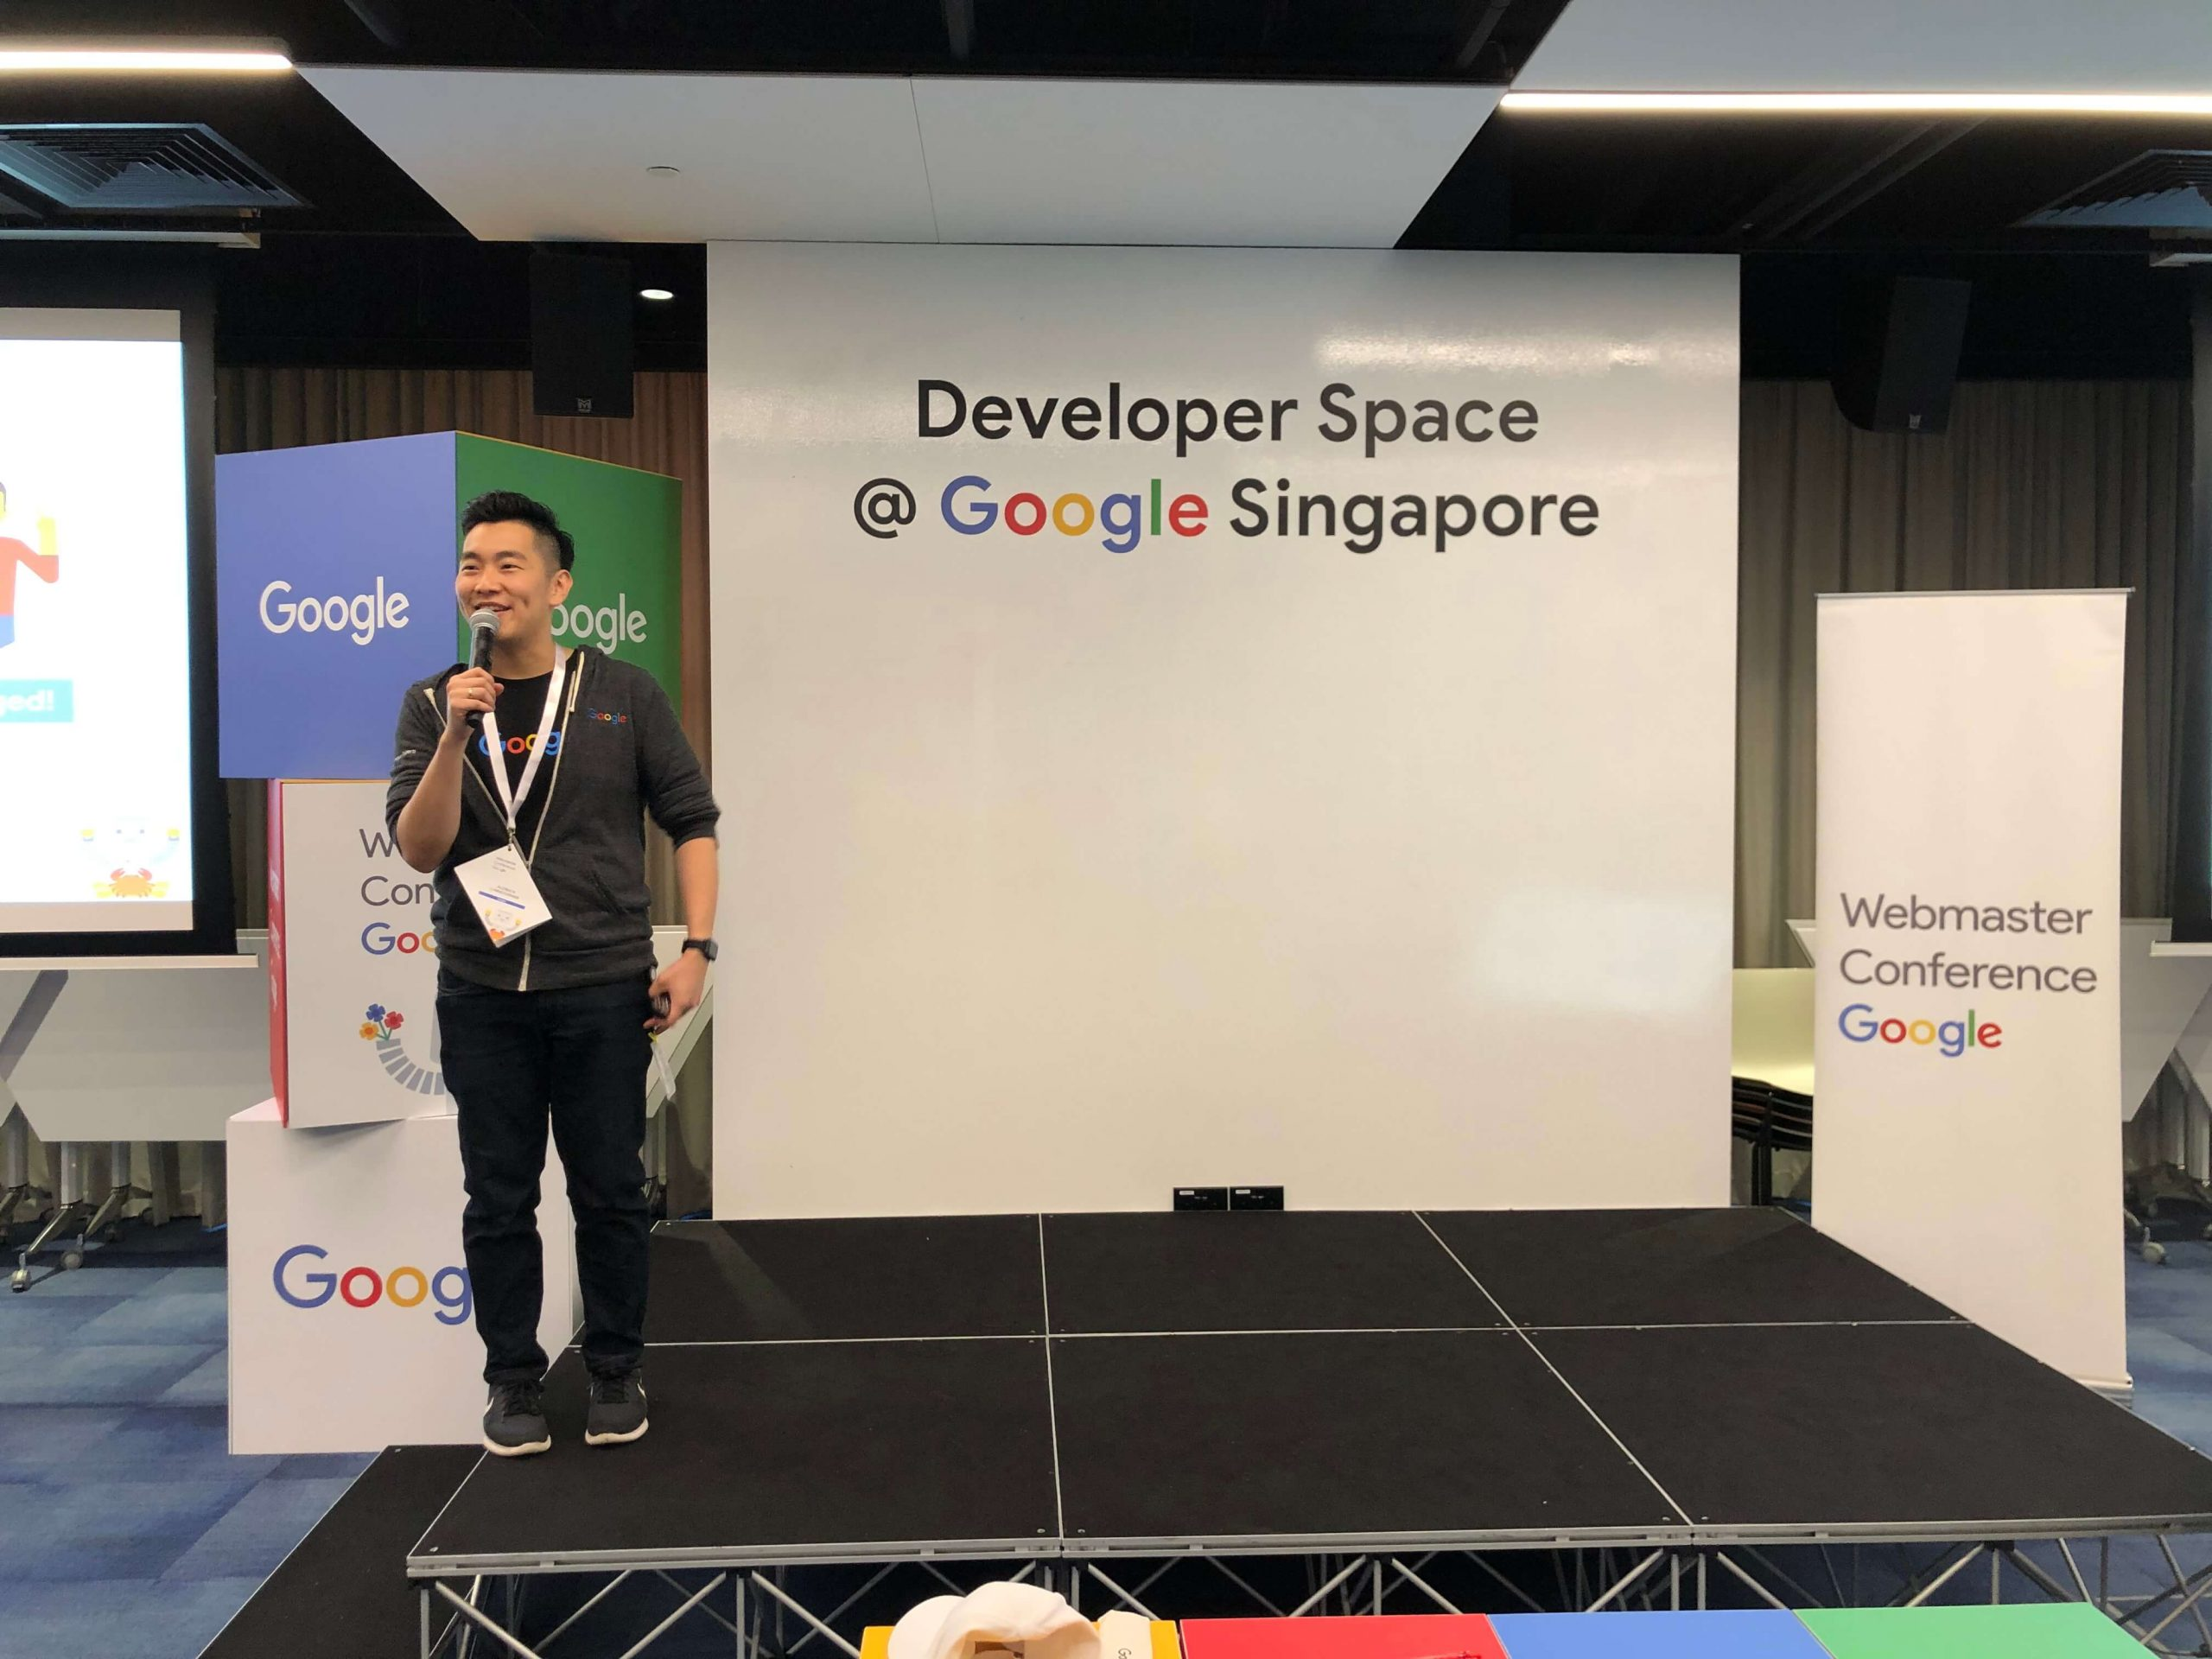 webmaster conference google scaled